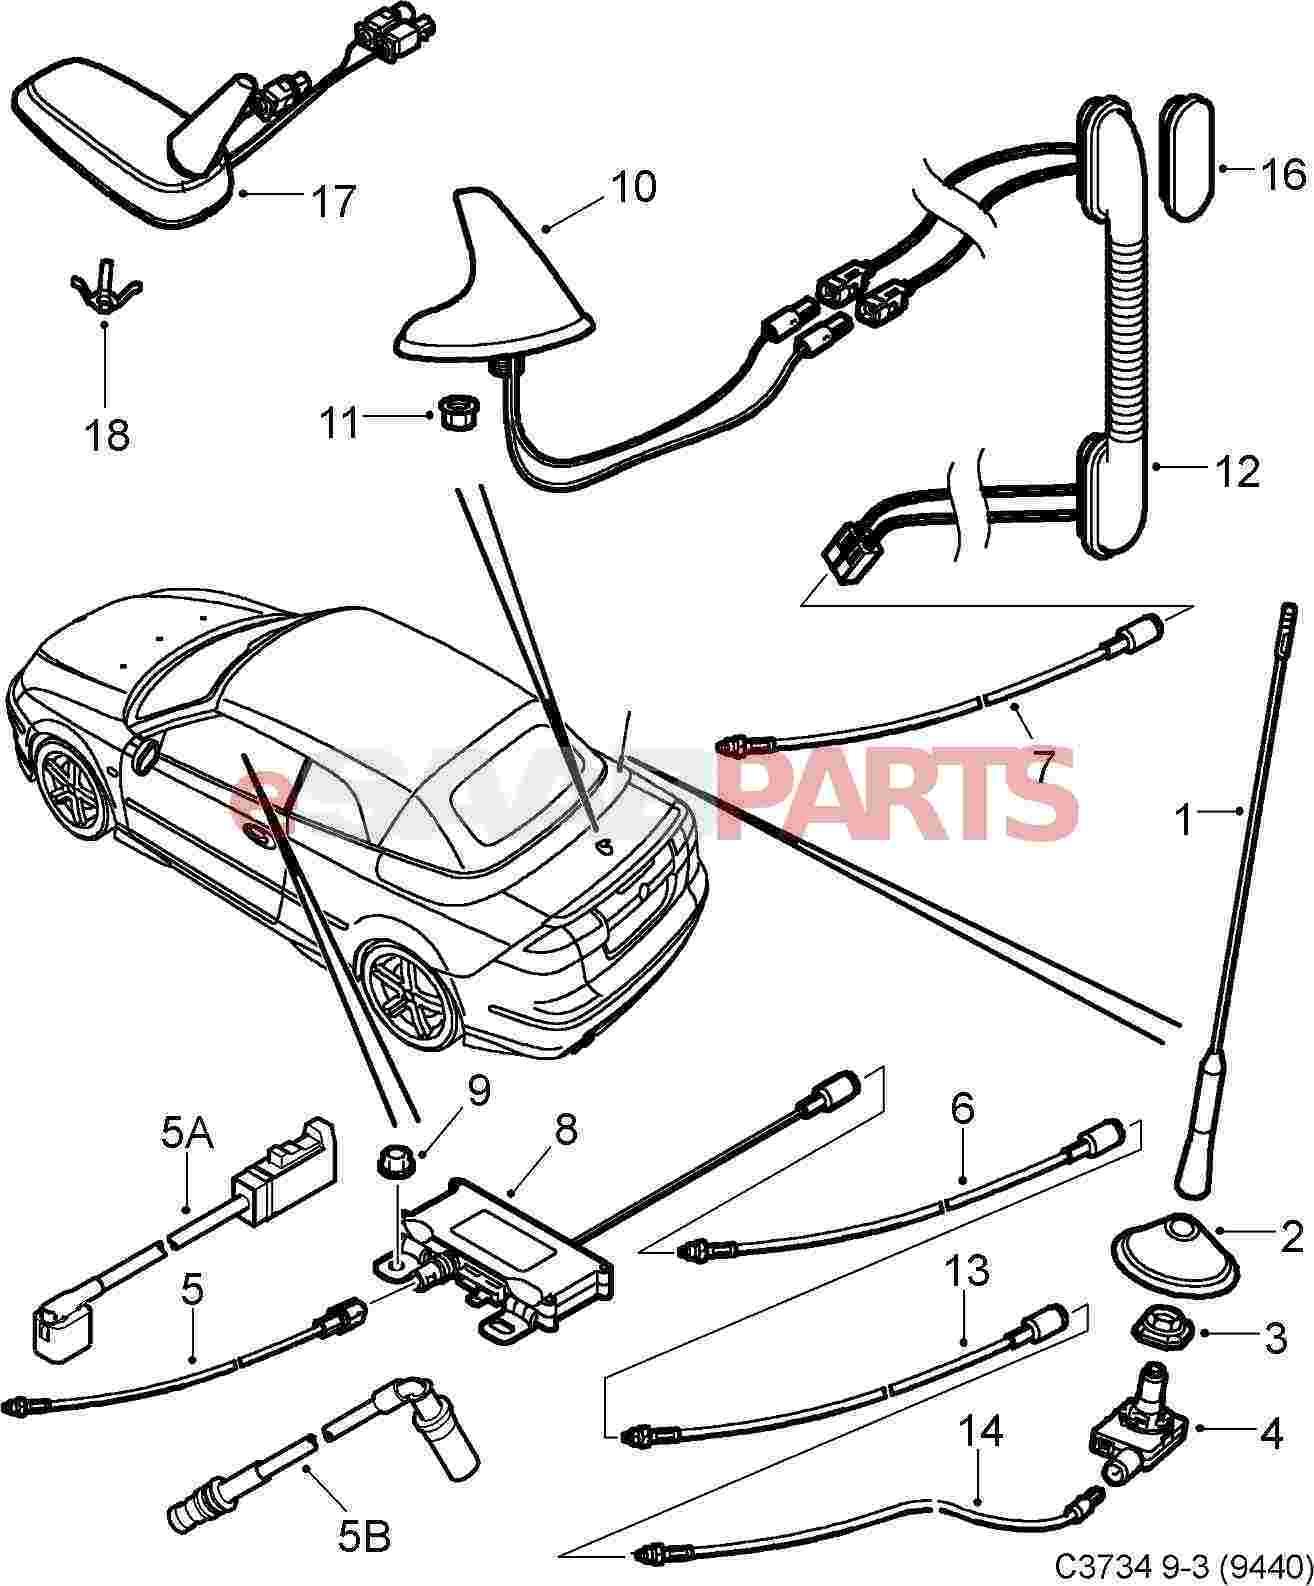 1994 subaru justy wiring diagram